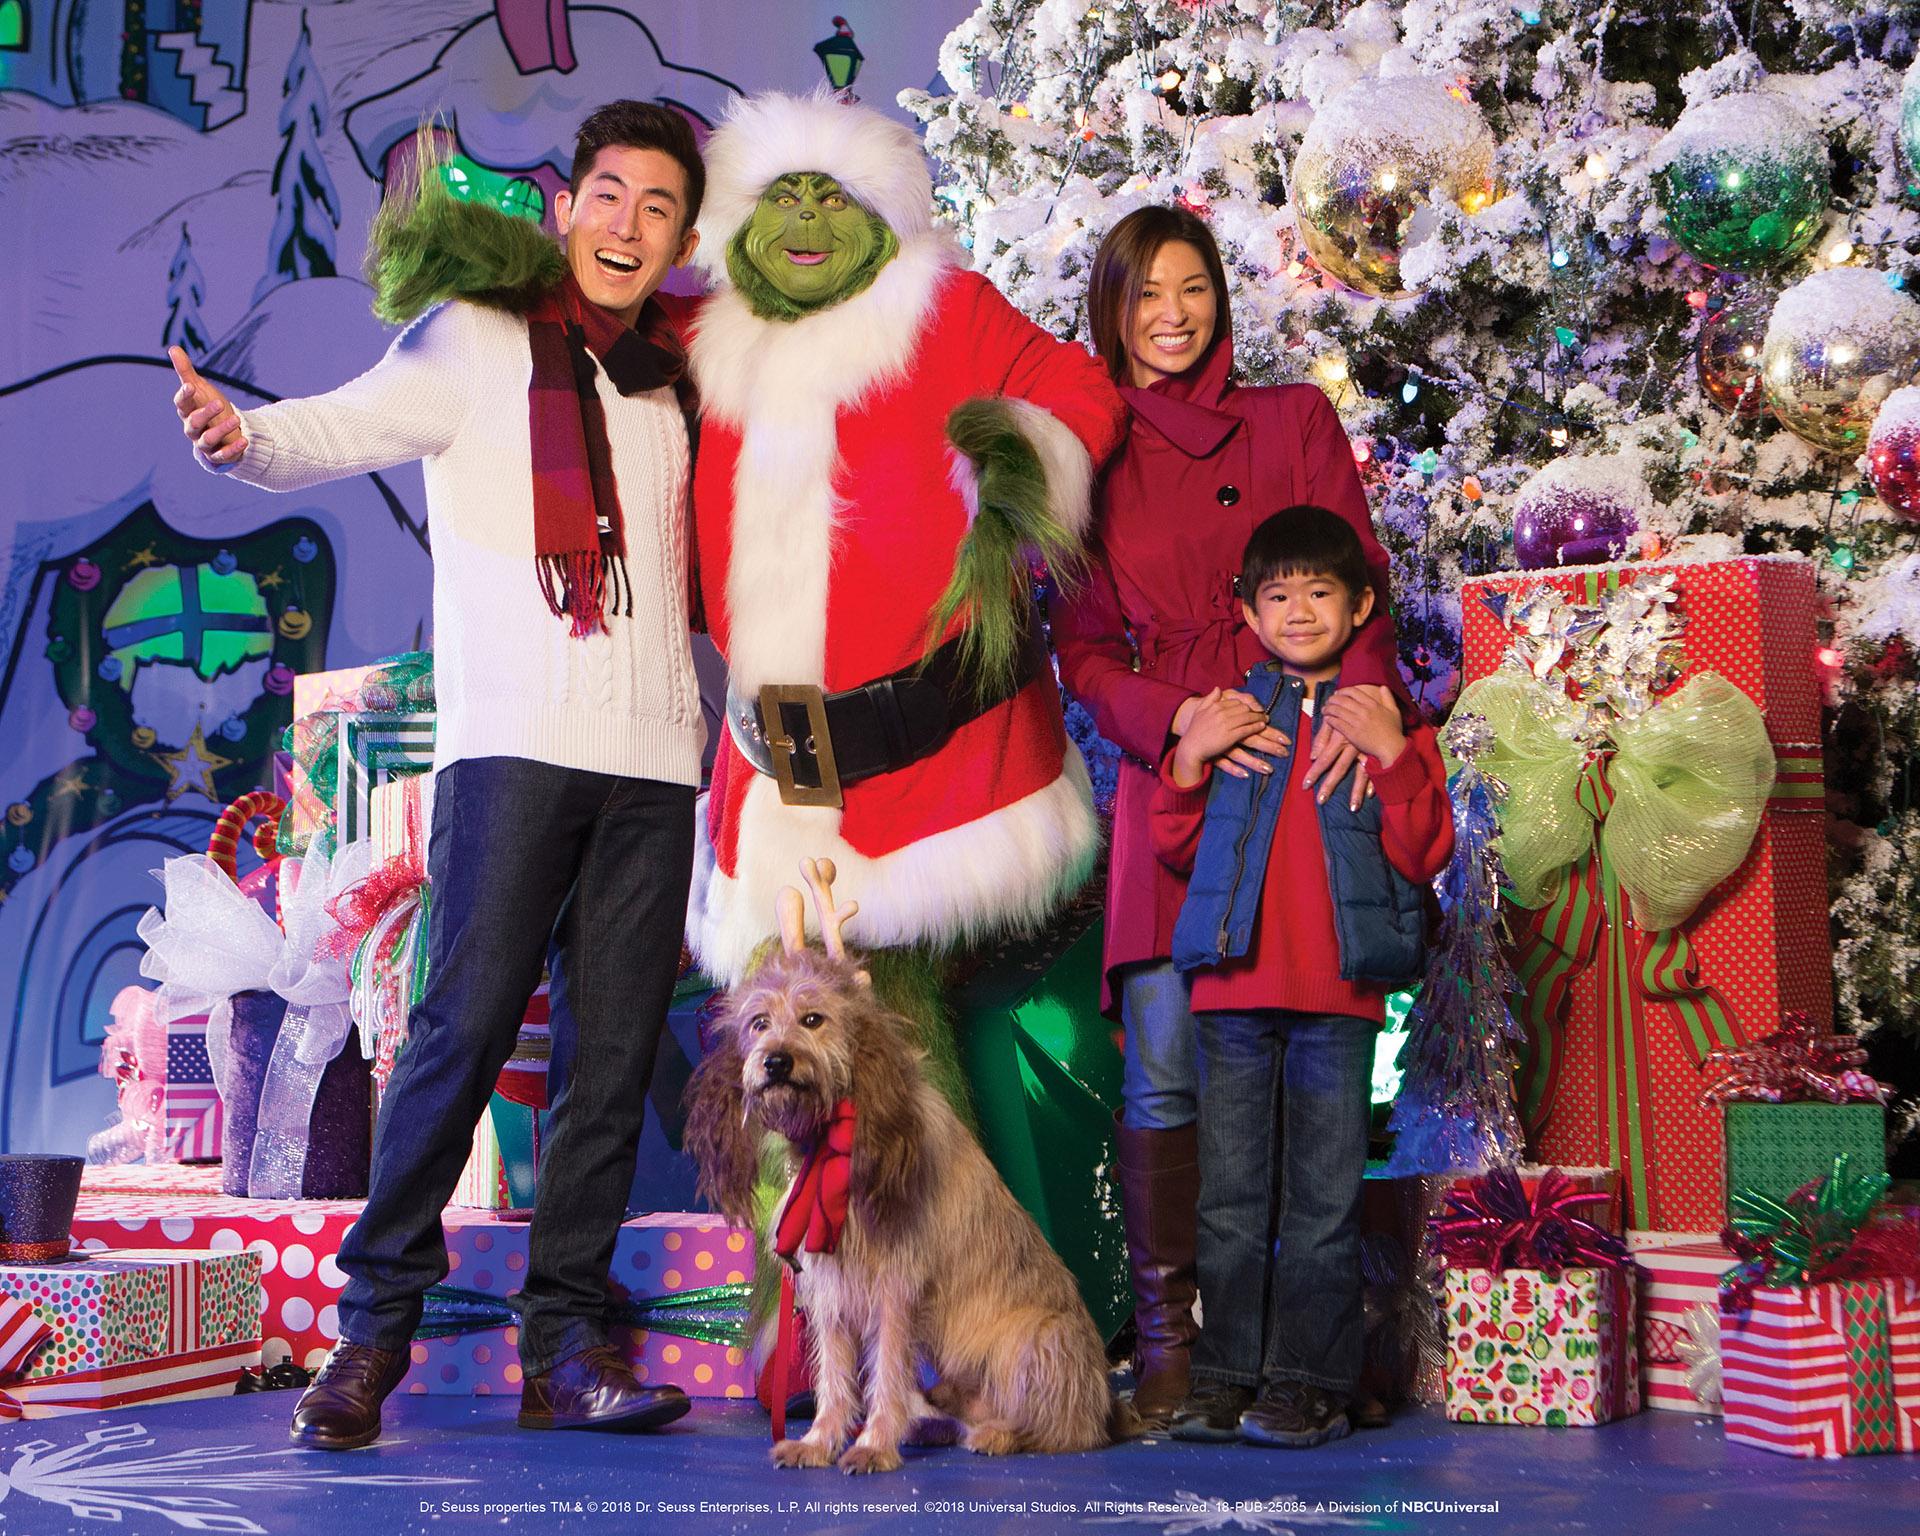 Photo courtesy of Universal Studios Hollywood.